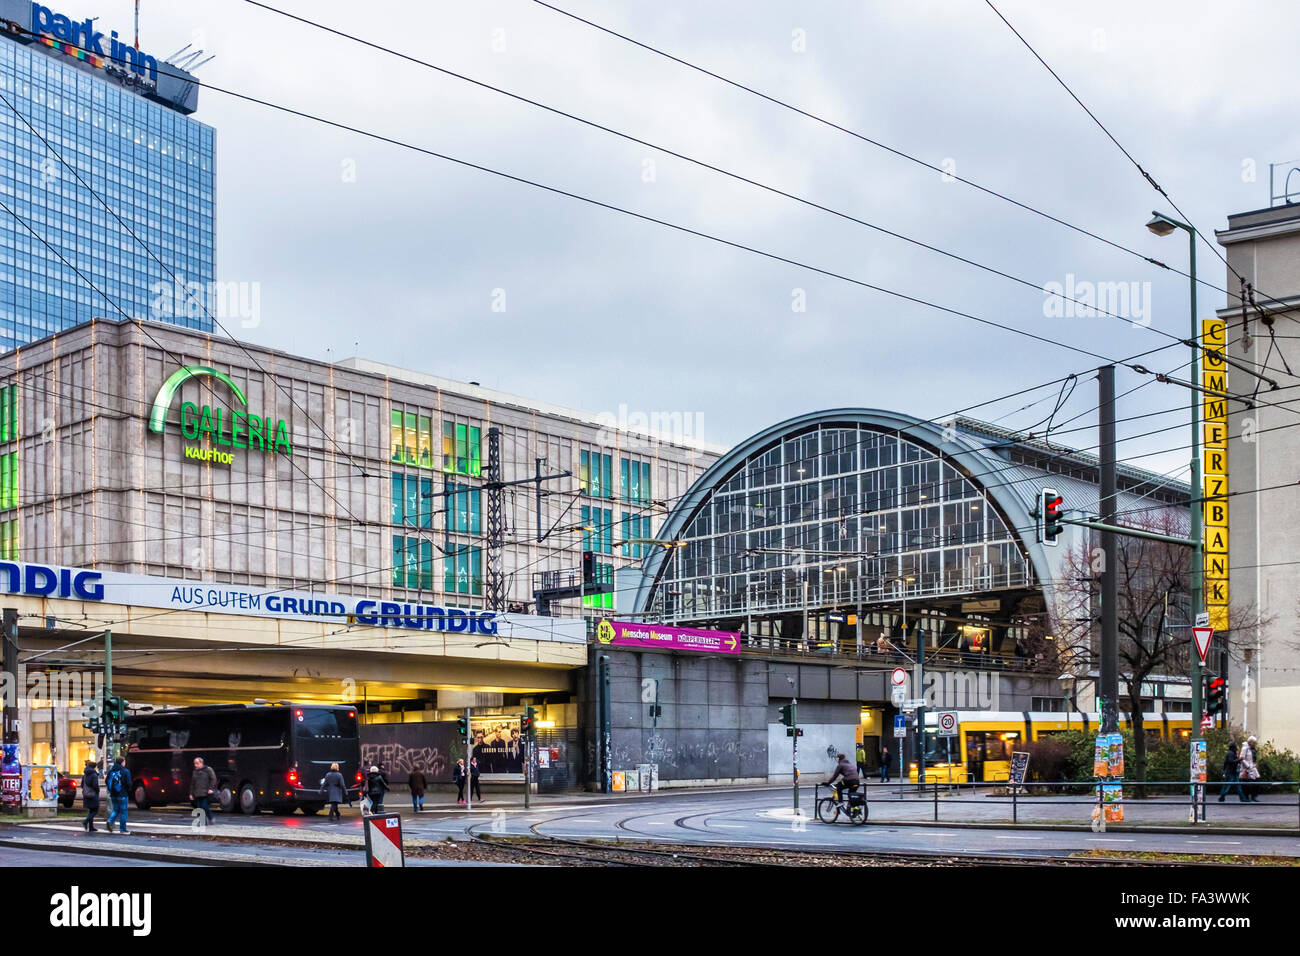 Berlin Alexanderplatz S-bahn railway station, tram and Galeria Kaufhof department store and Park Inn hotel - Stock Image